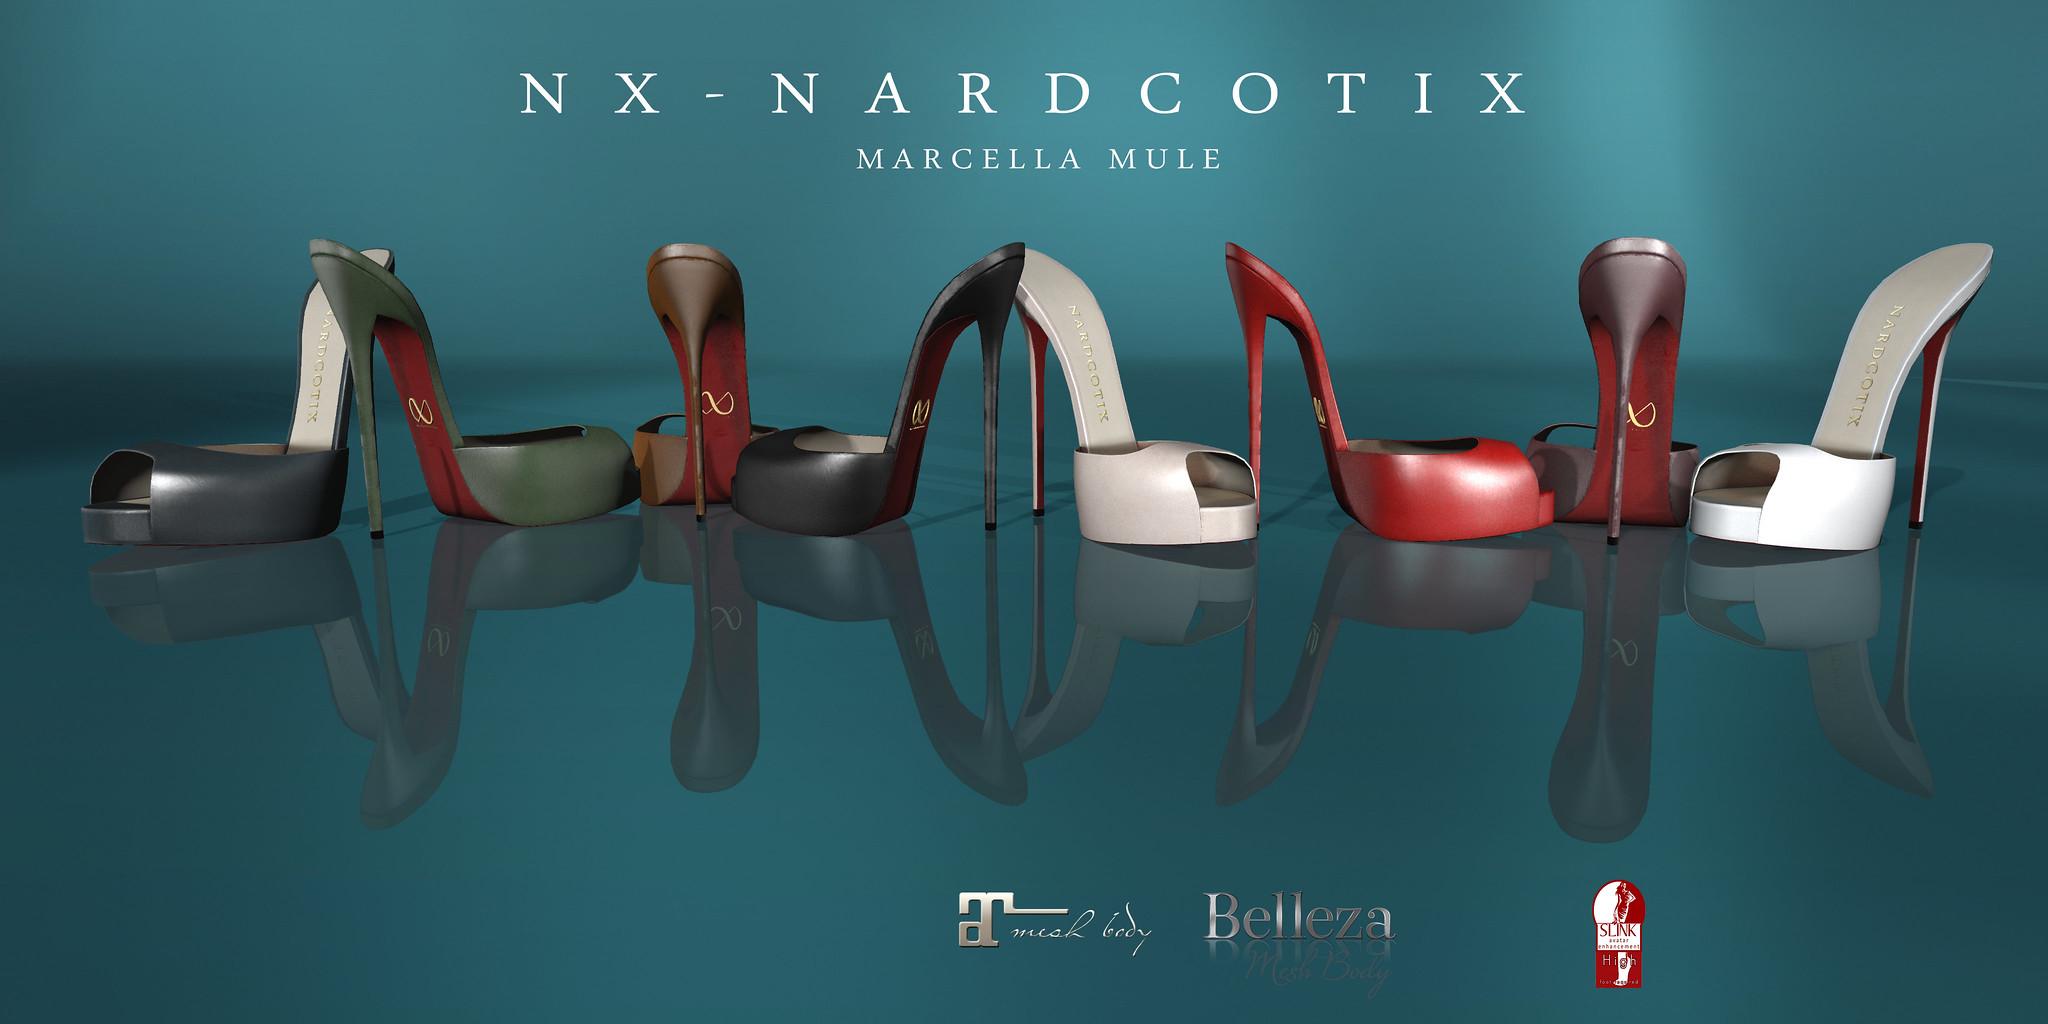 NX-Nardcotix Marcella Mule Poster